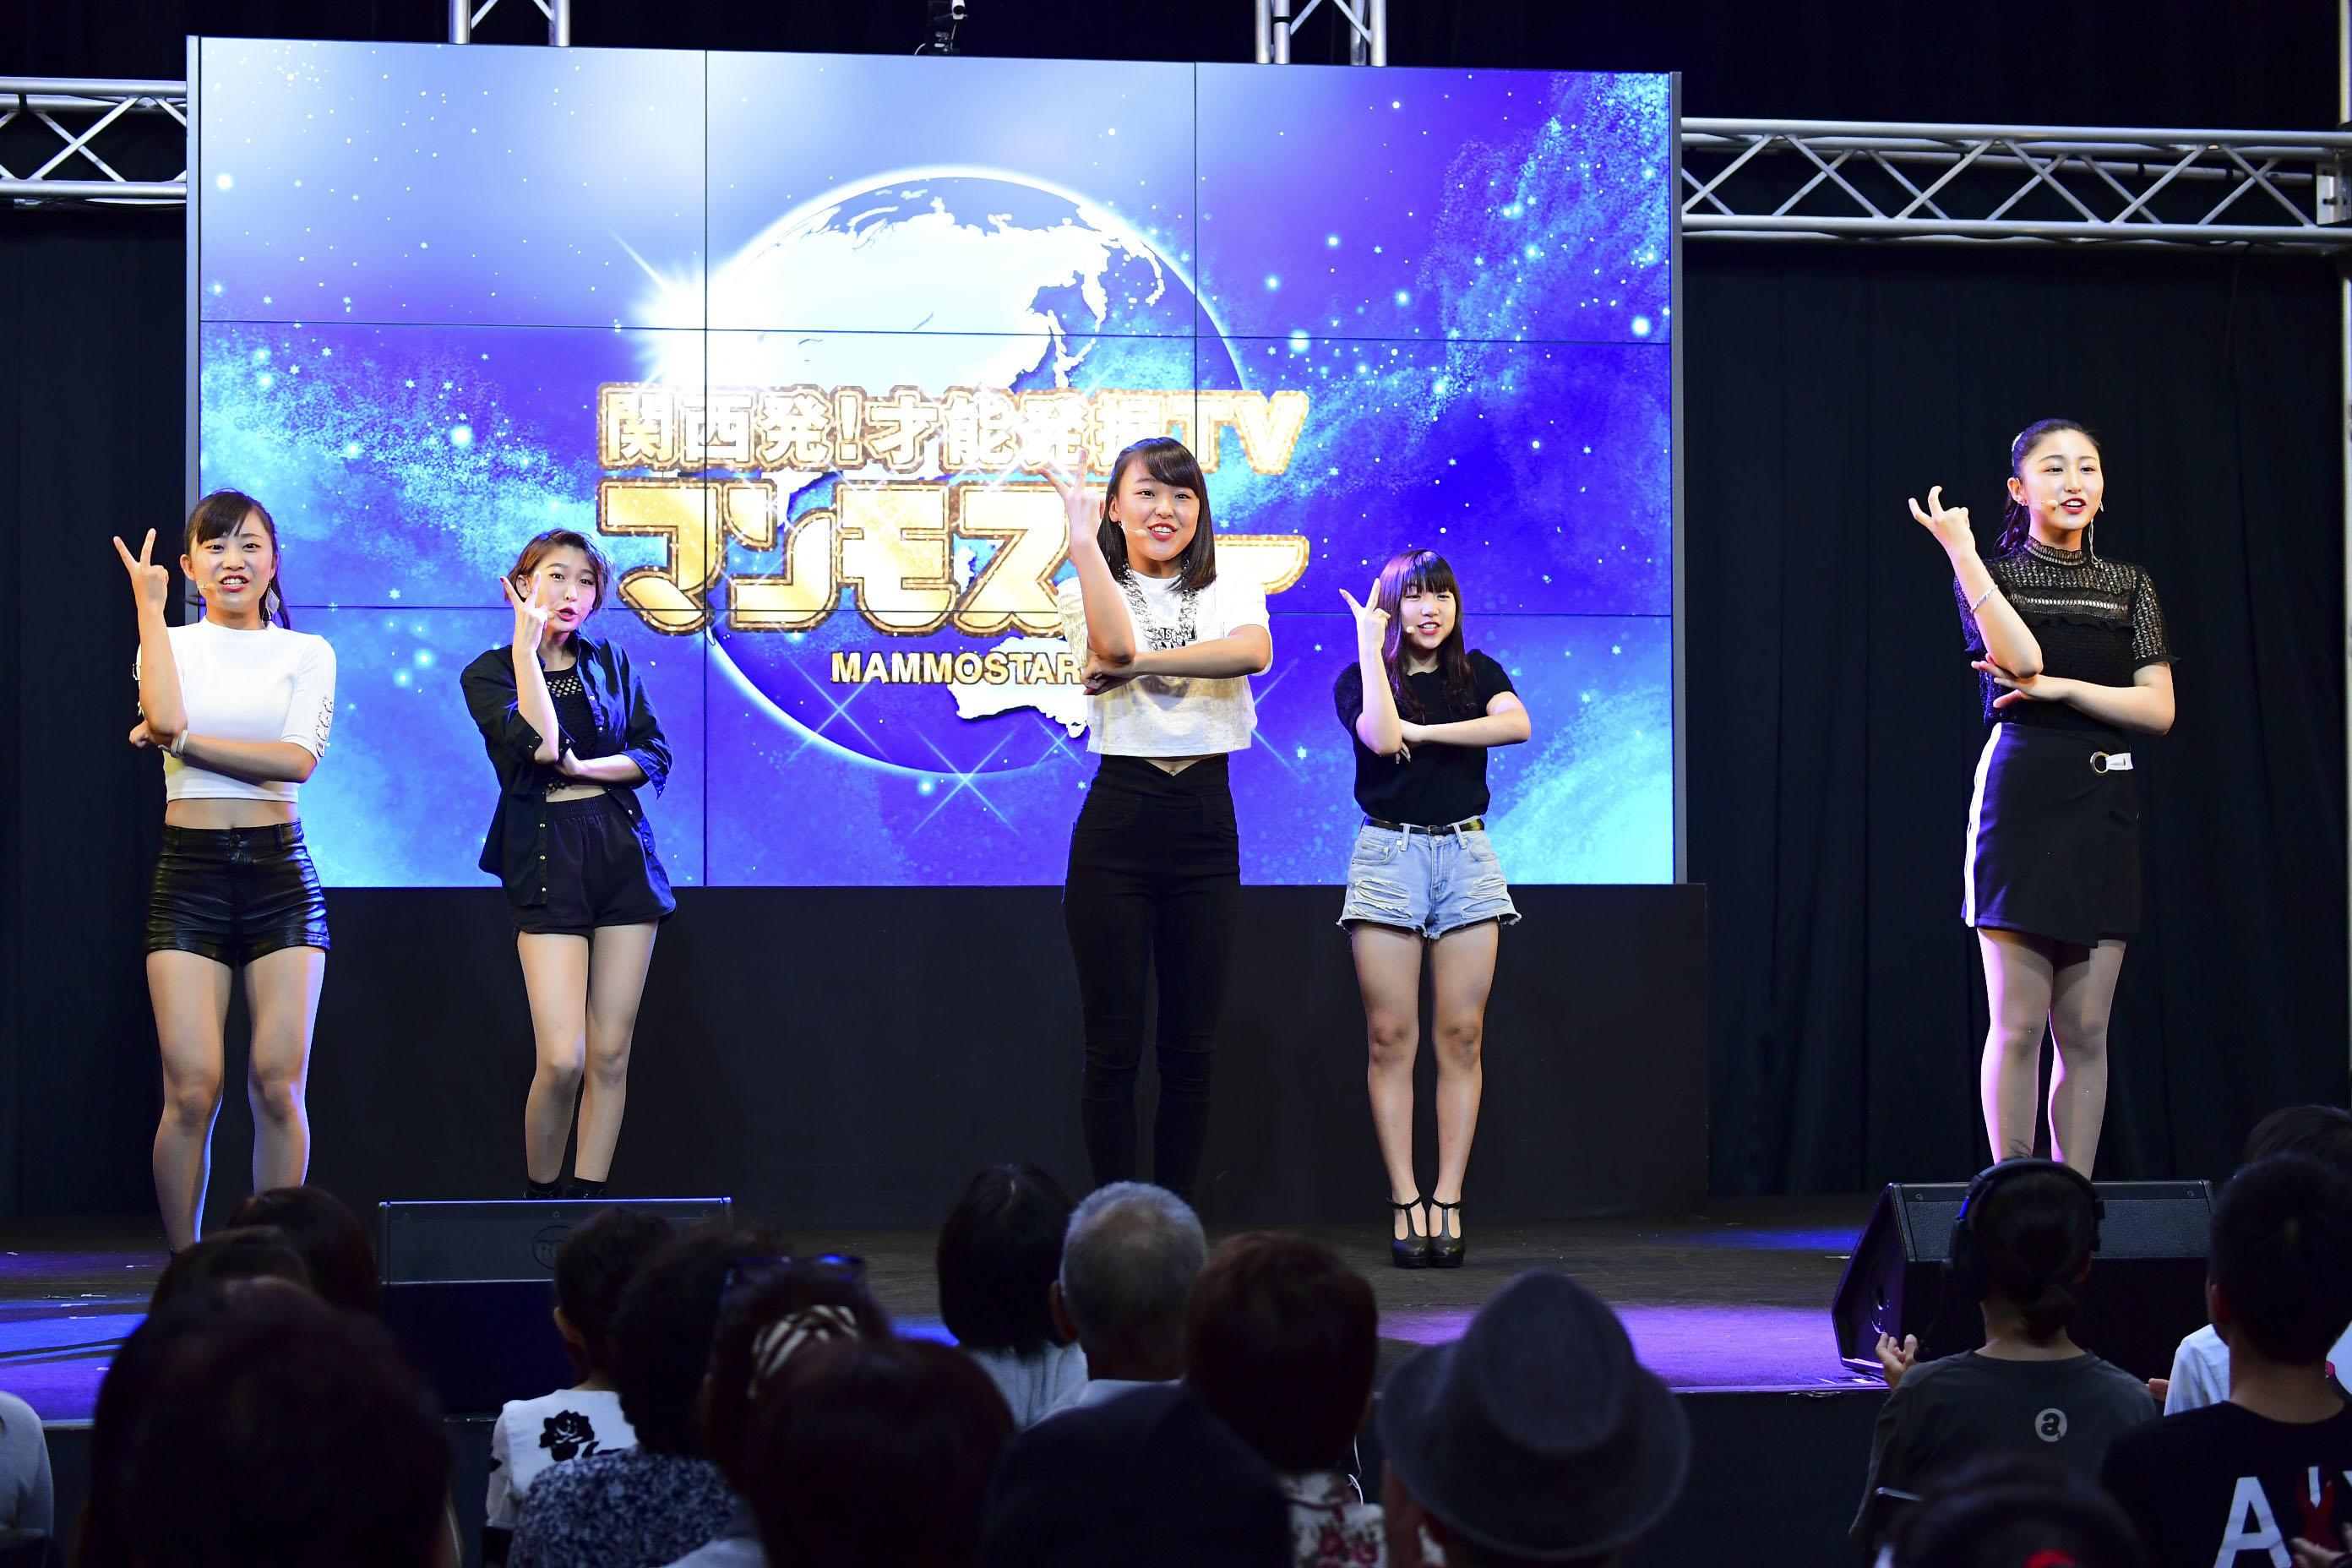 http://news.yoshimoto.co.jp/20170924093449-e127648f791b24a277430c09b52872d25bd36215.jpg